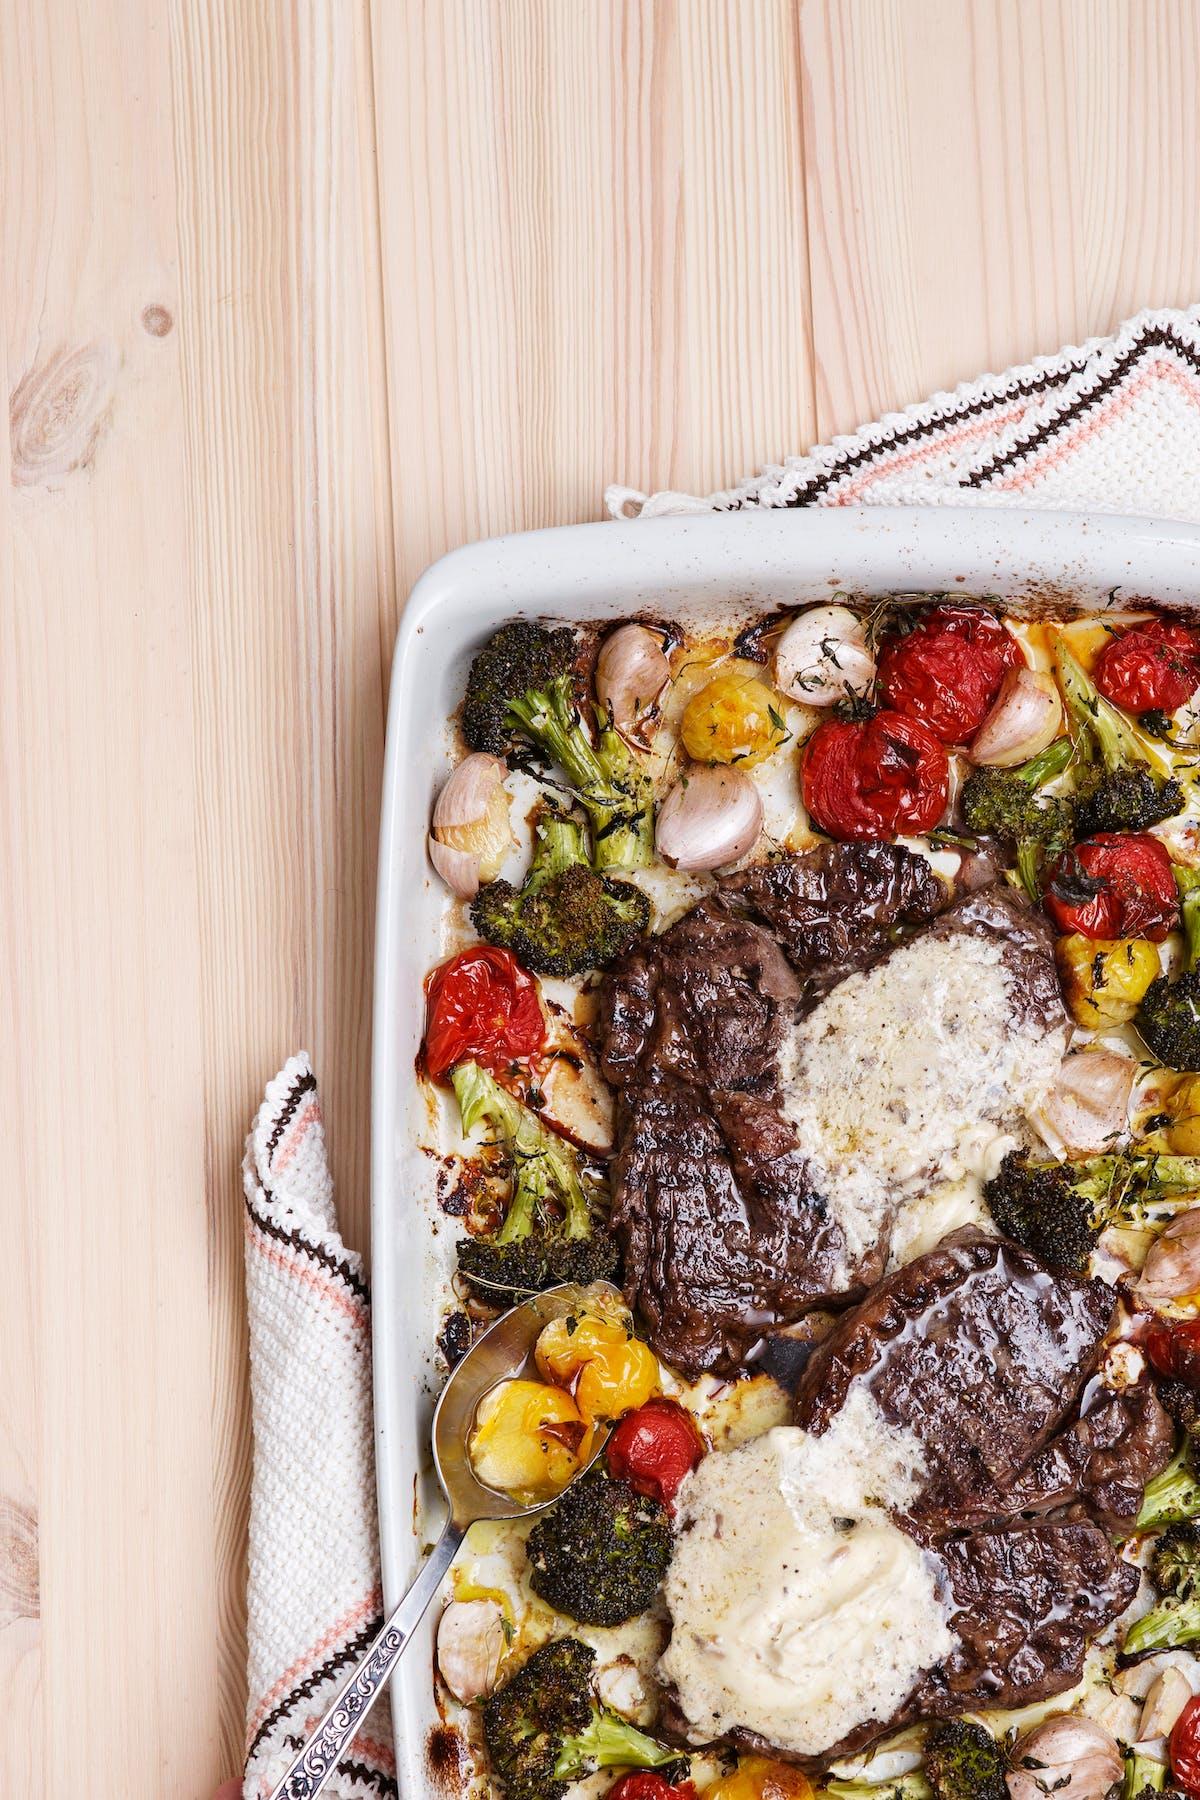 how to make ribeye steak in oven